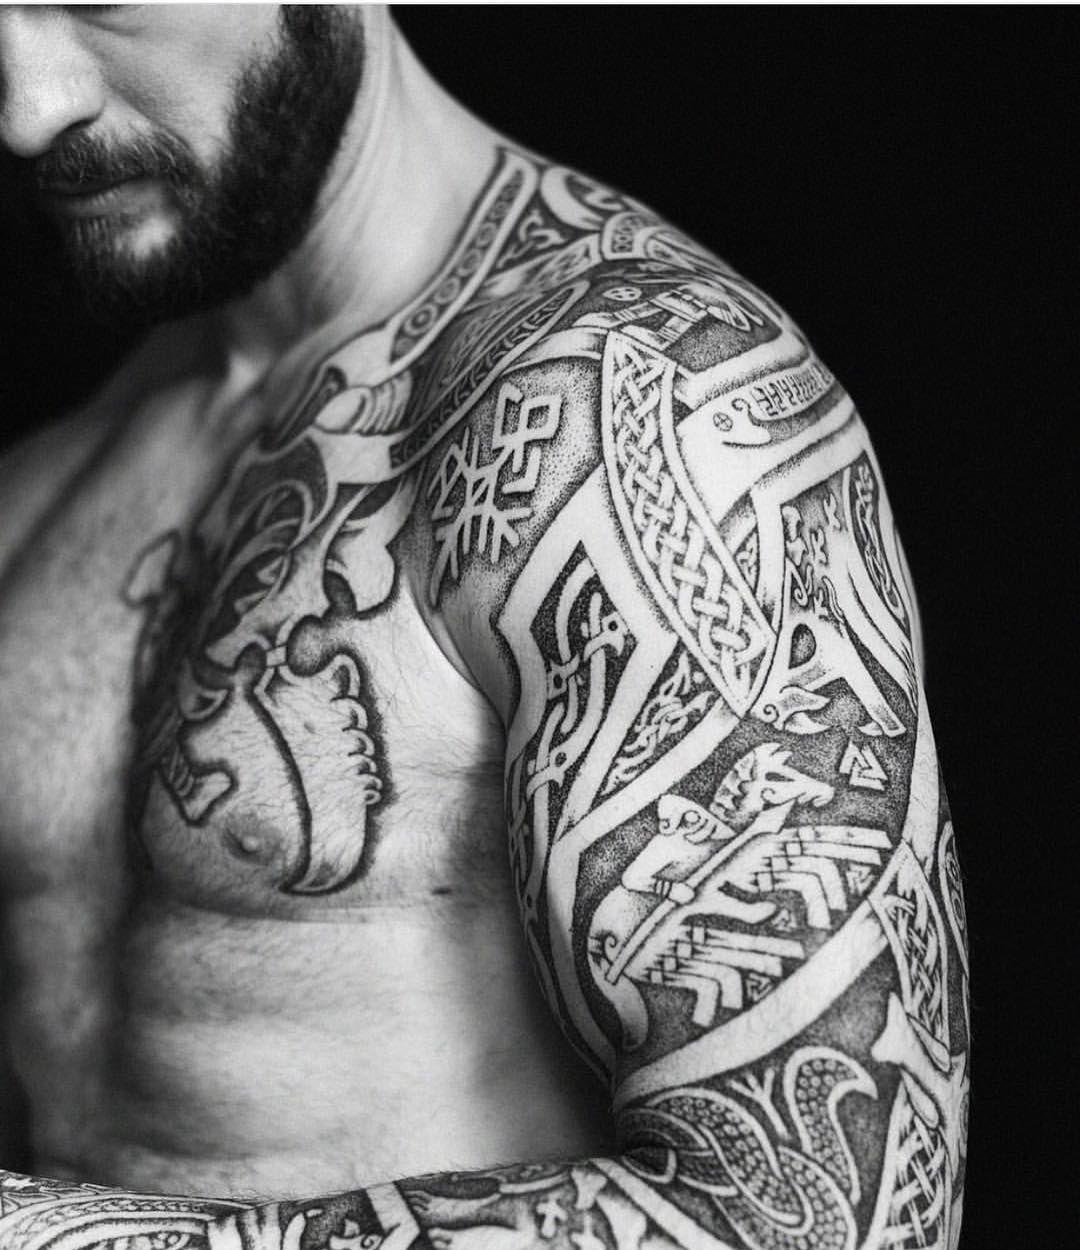 Ragnarok Sleeve On Isaksen Tom On Instagram Good Looking Beard Too Viking Tattoo Sleeve Nordic Tattoo Scandinavian Tattoo